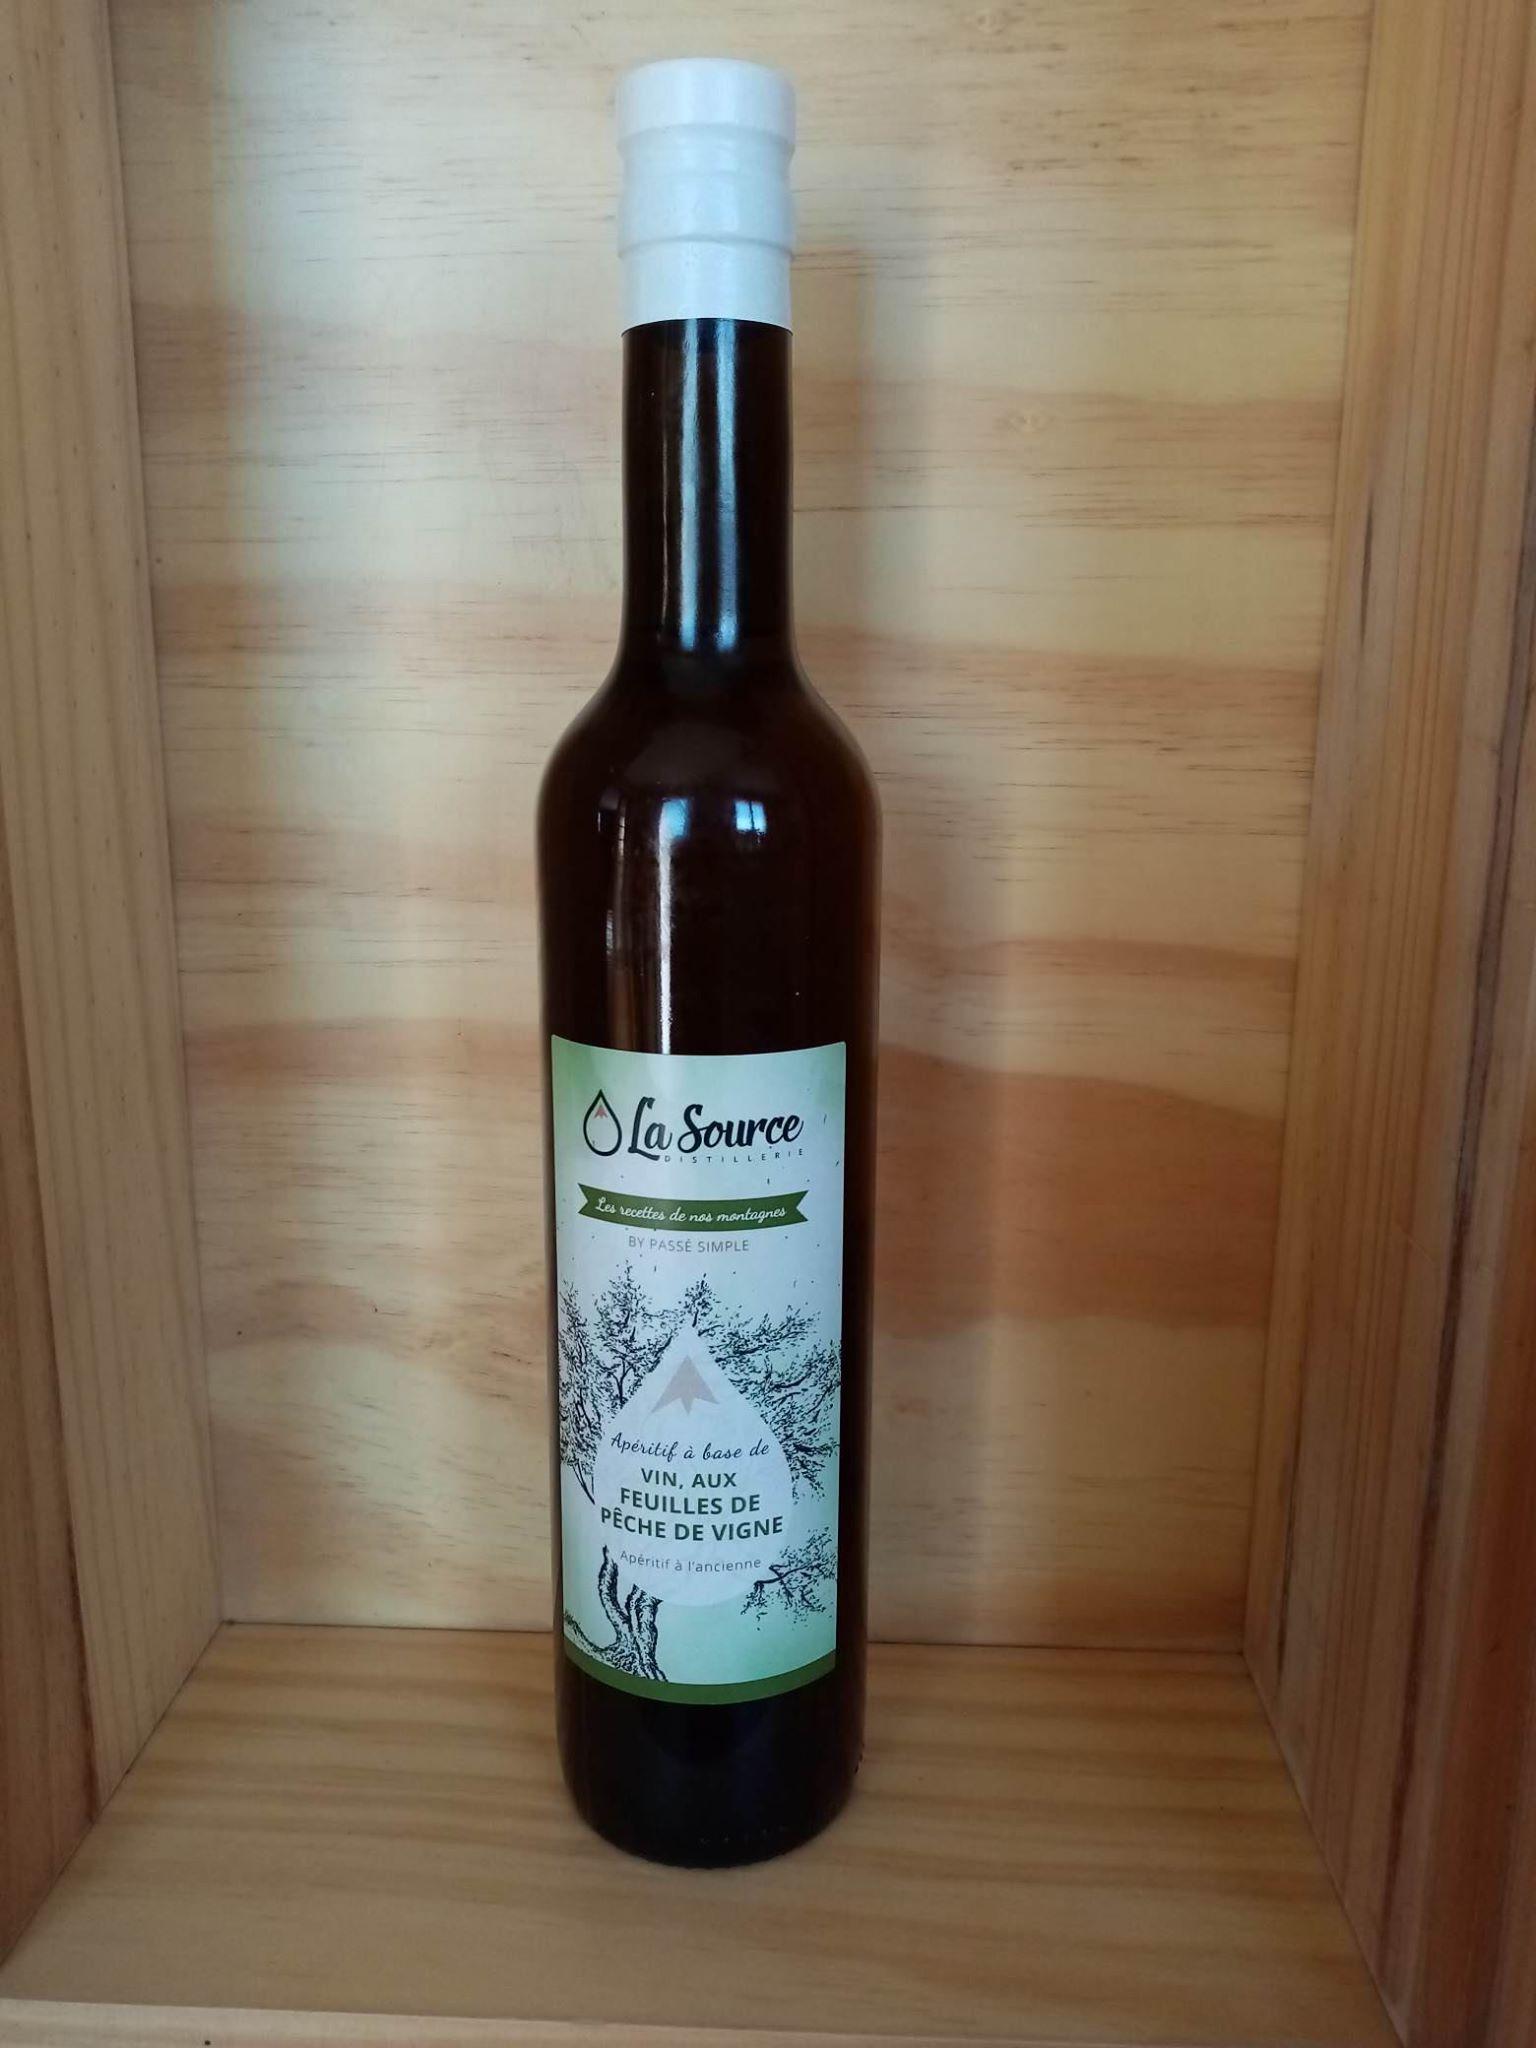 https://www.lasource-distillerie.fr/wp-content/uploads/2020/04/pdv-2-1.jpg